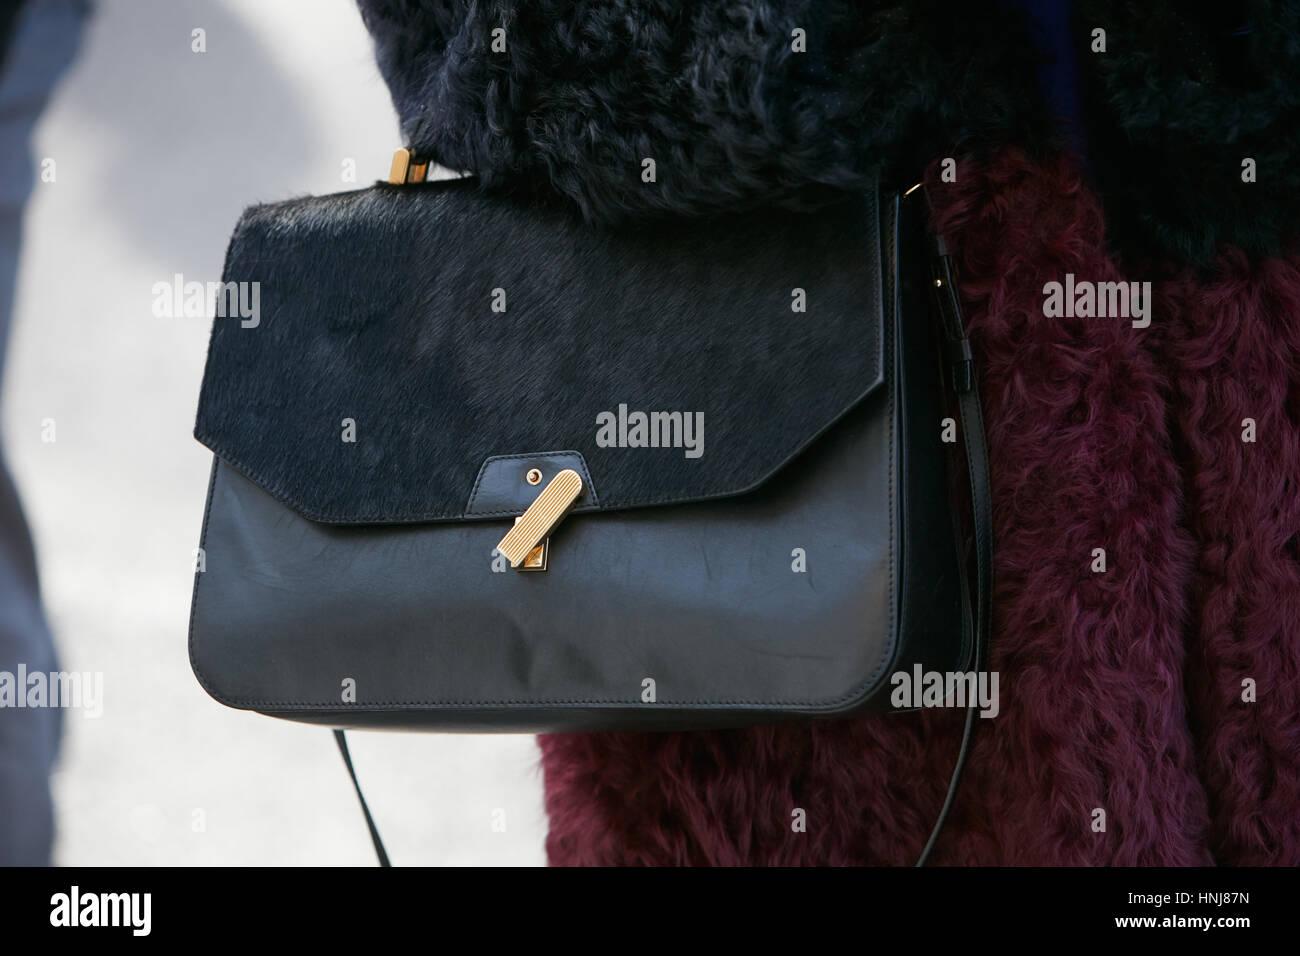 71f6cd539b Woman with black leather and fur bag before Giorgio Armani fashion show